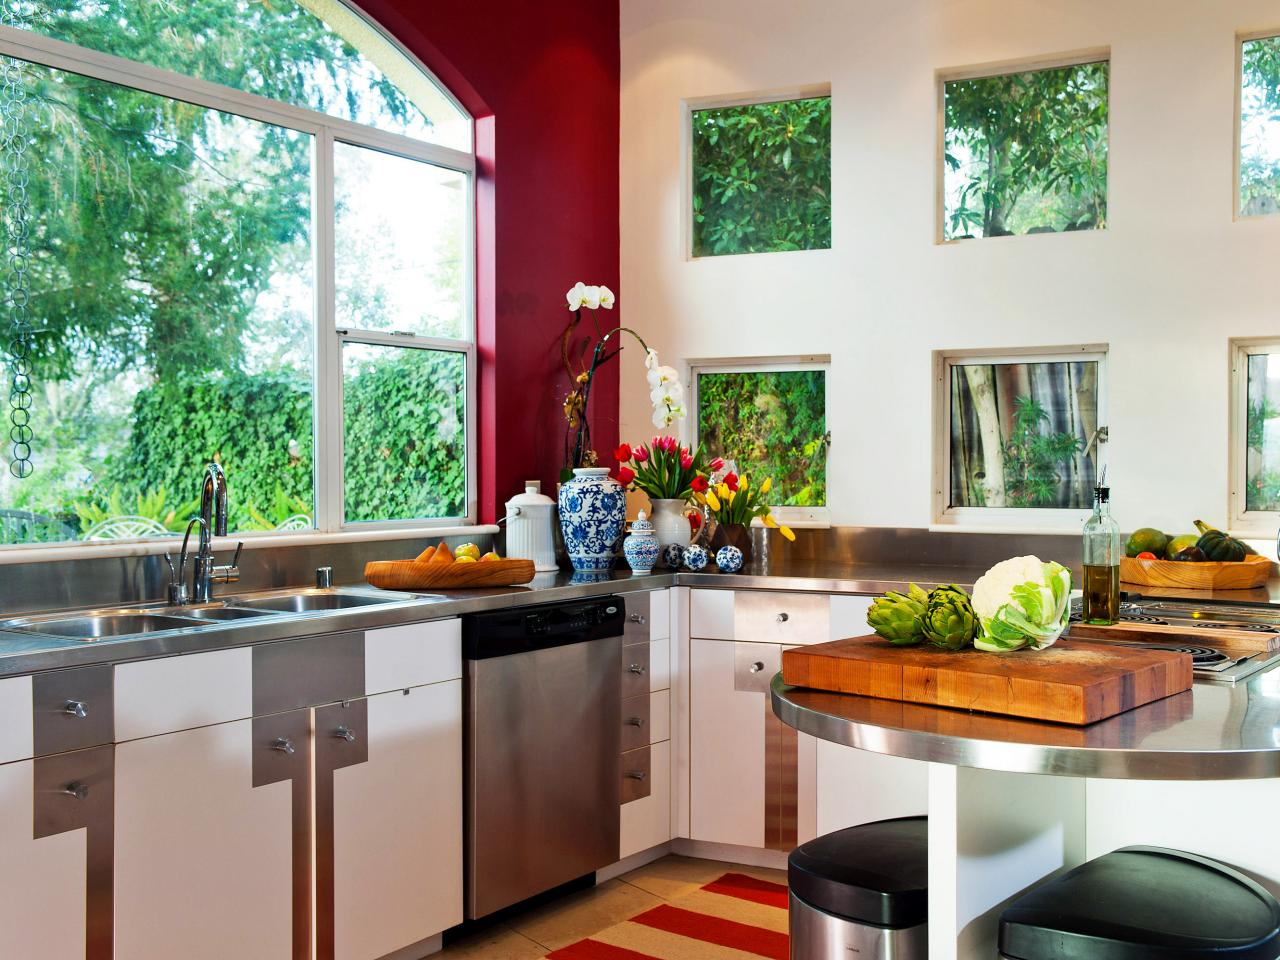 Kitchen design photos hgtv for Kitchen design kit